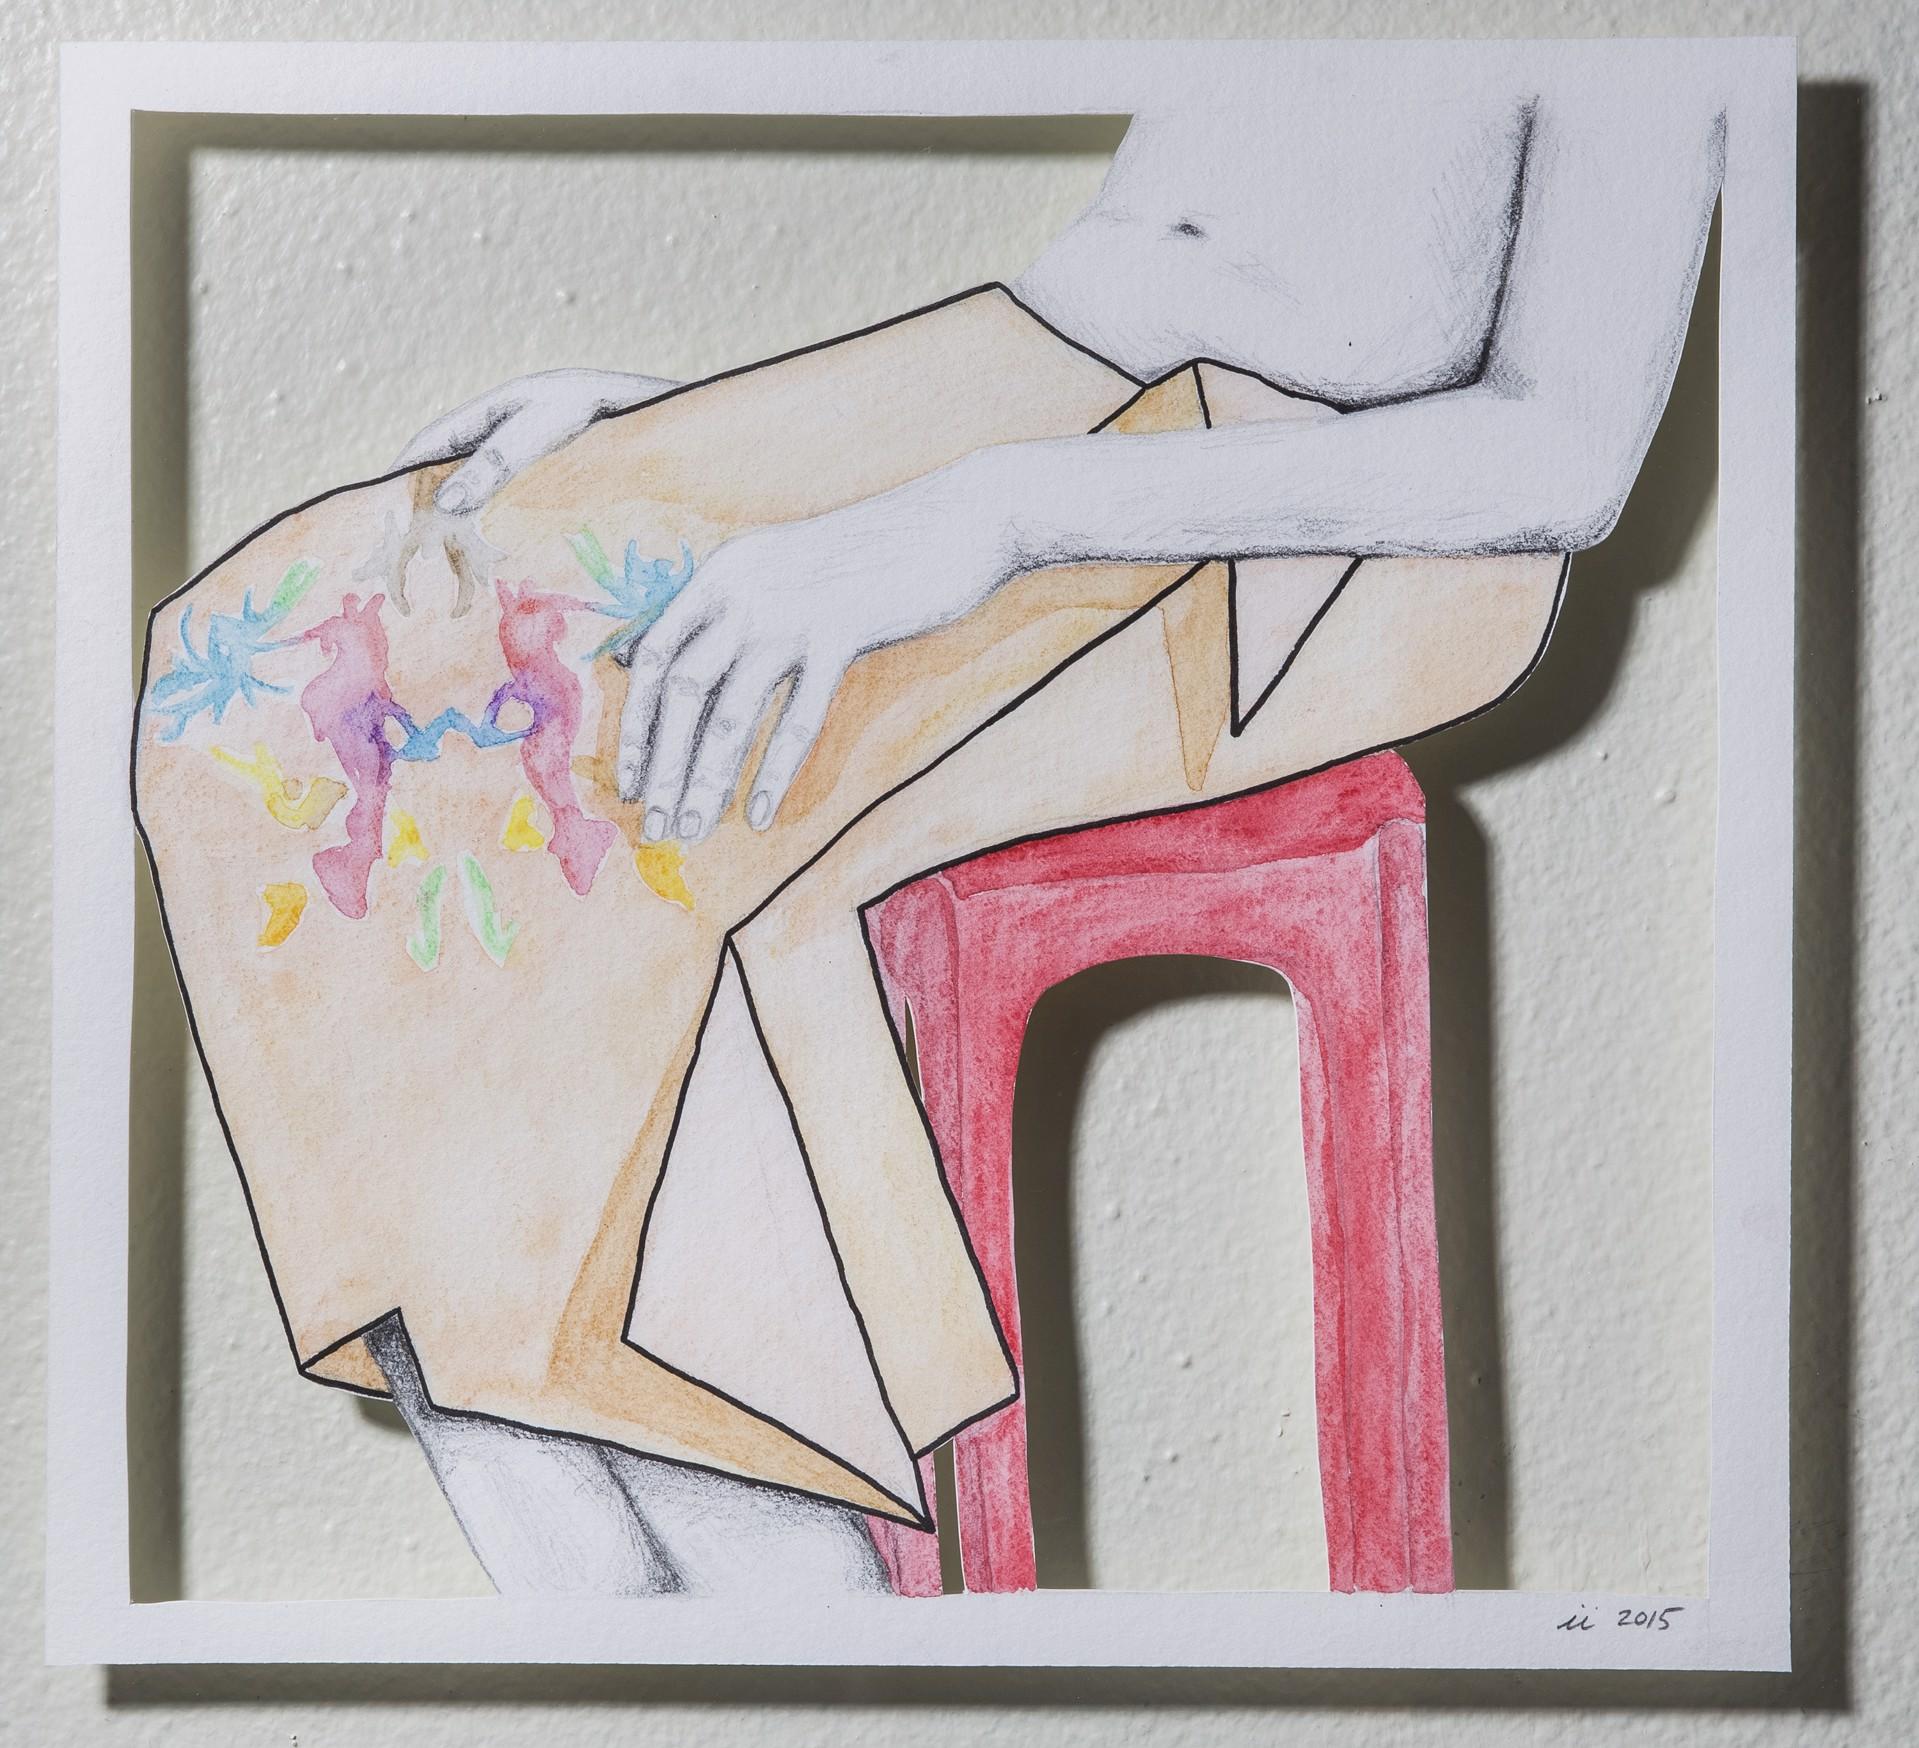 Rorschach Dreams by Lauren Iida | Early Works